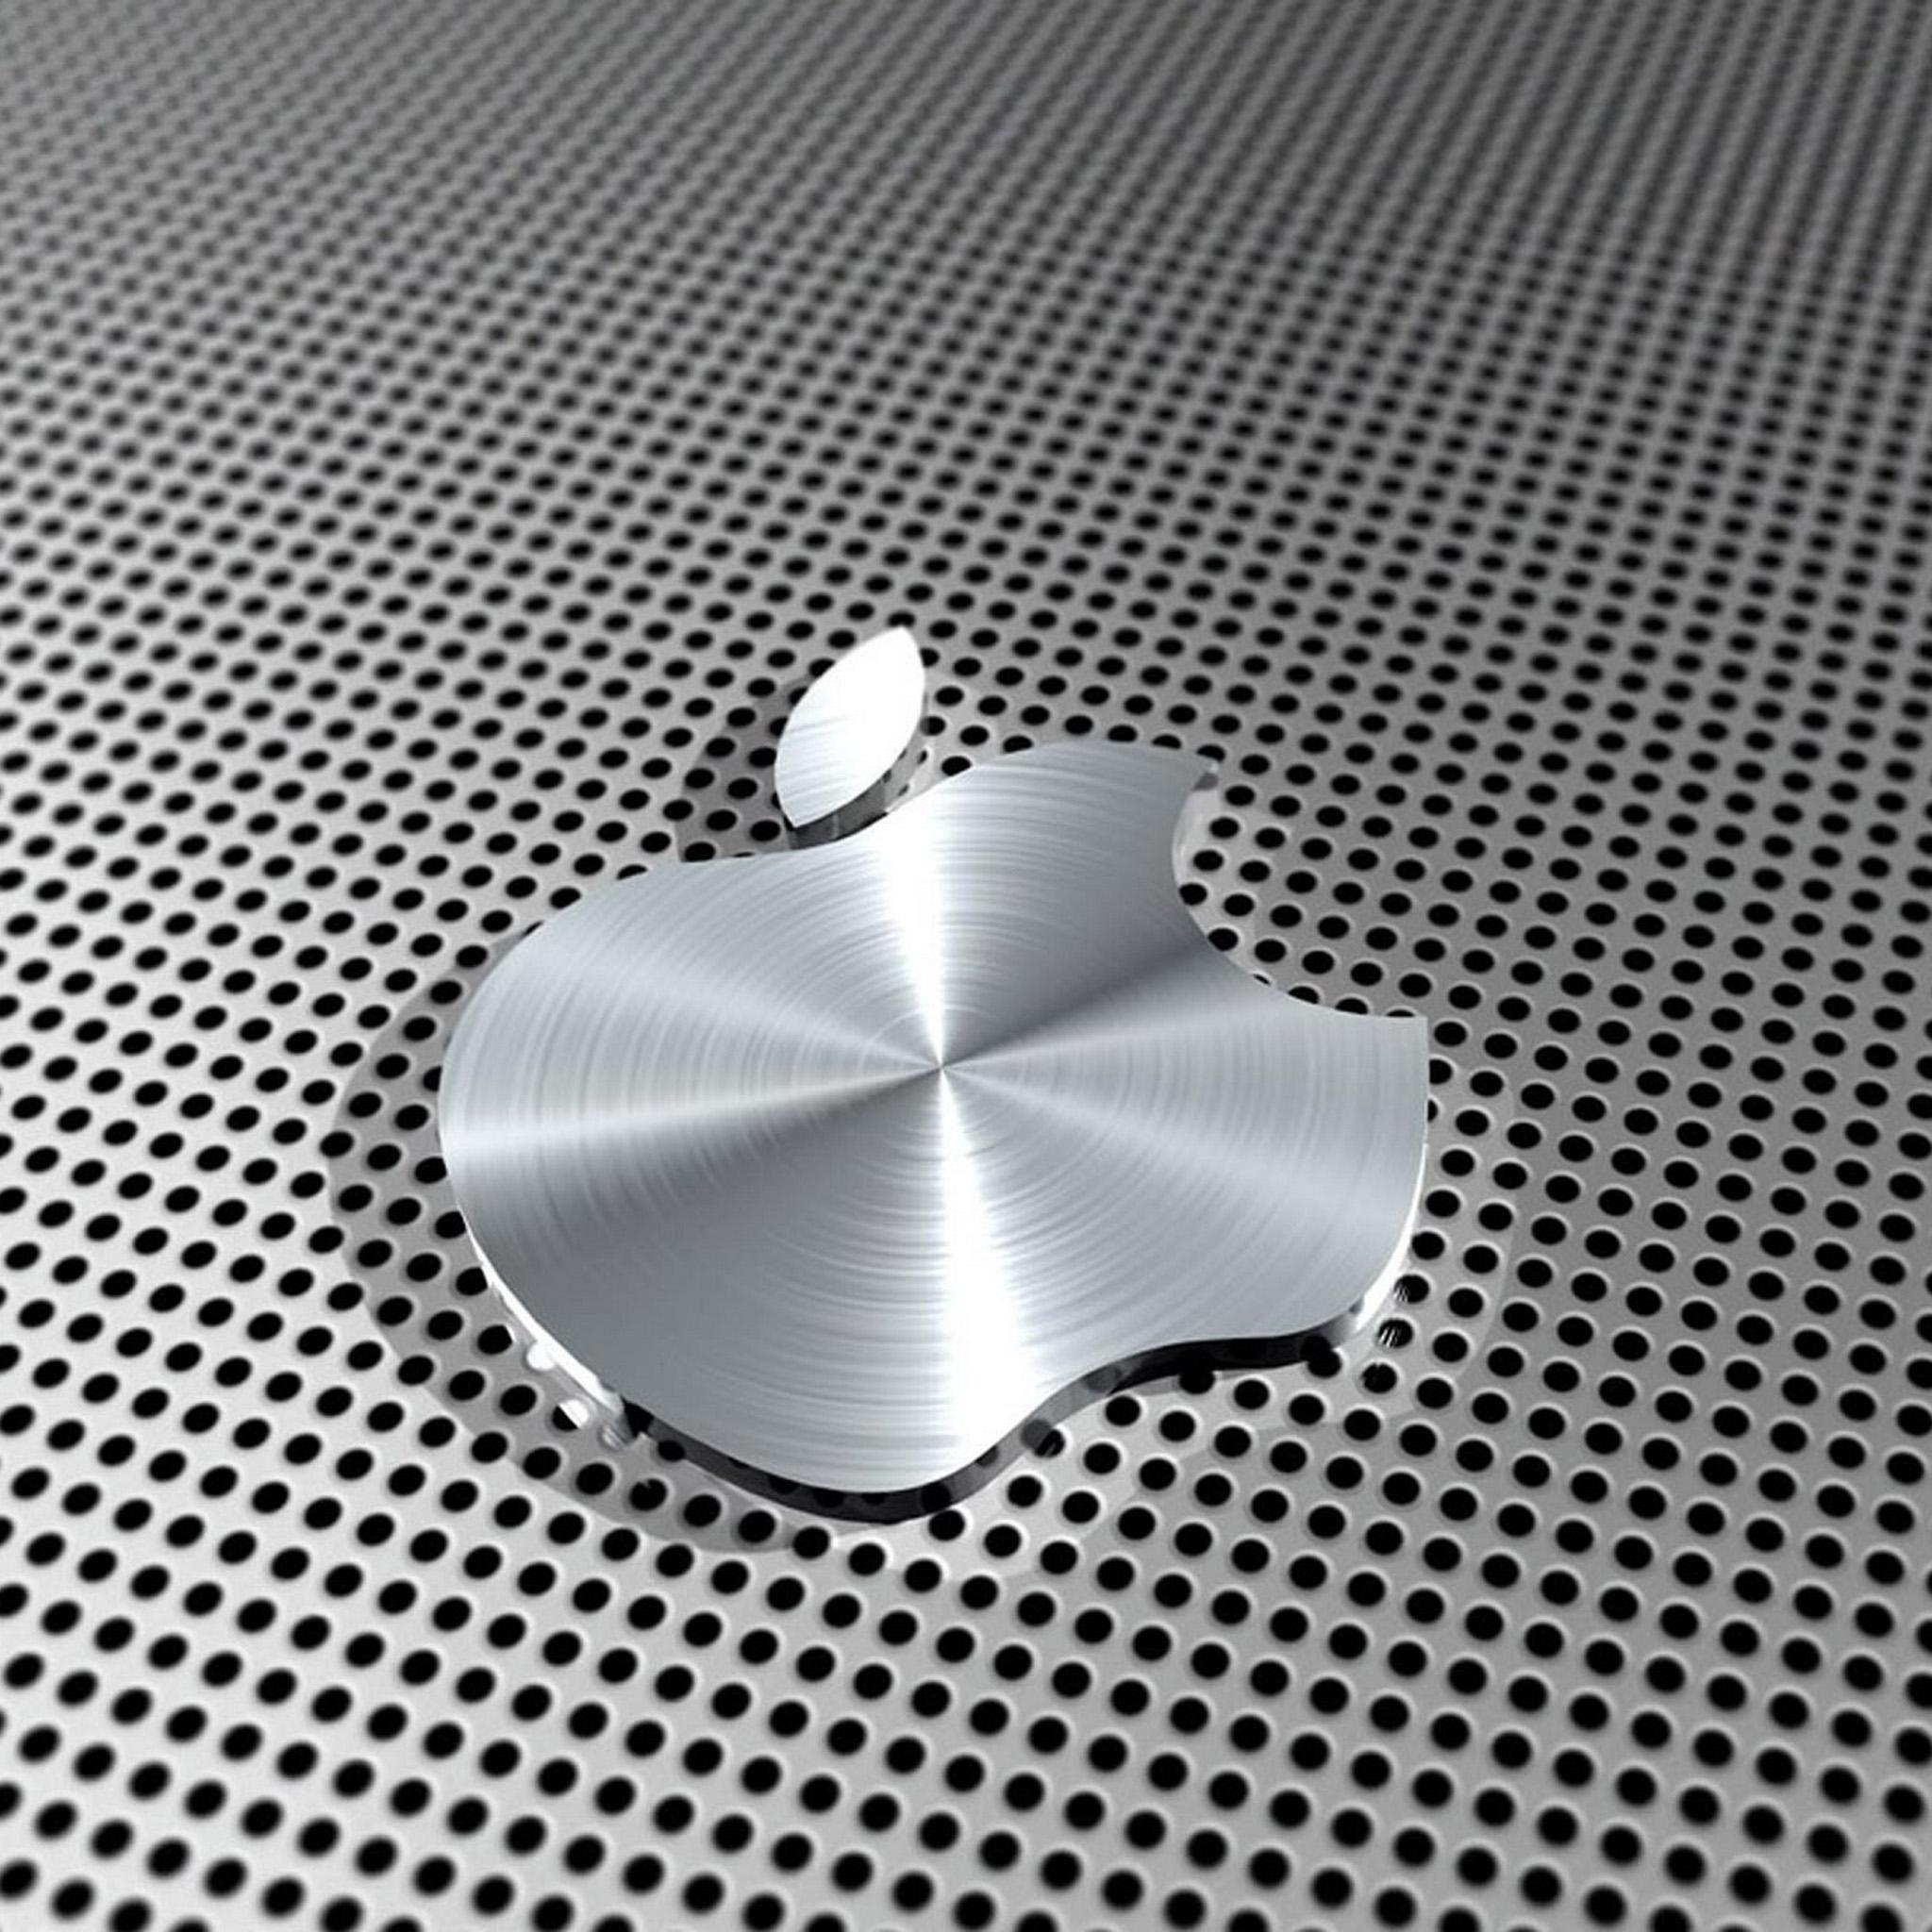 Hd Wallpapers Ipad Iphone Imac Mac Pro Air Names X Wallpaper Ee Bc F 2048x2048